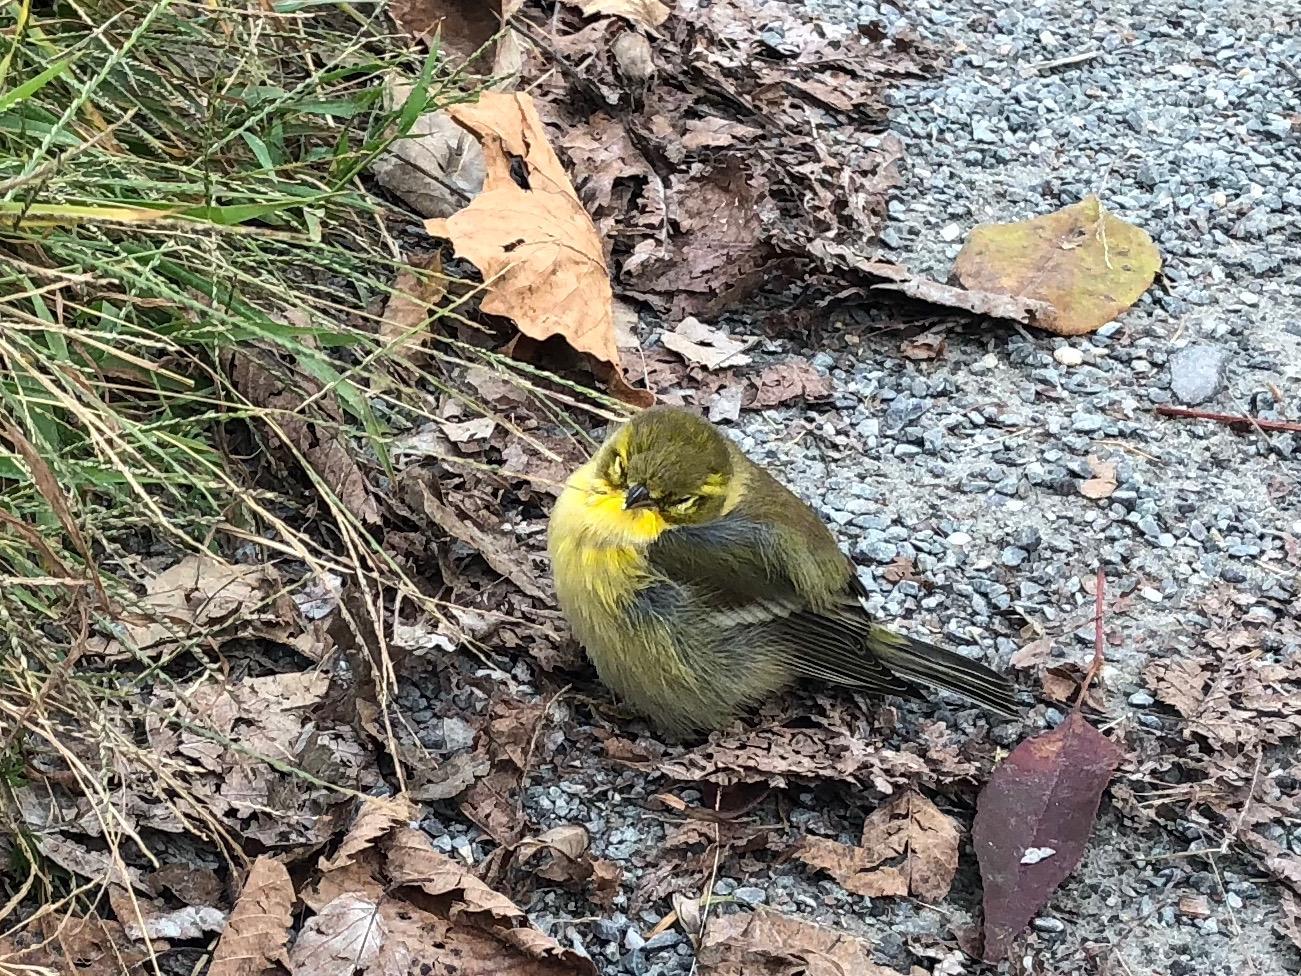 092918-injured-Blackpoll warbler